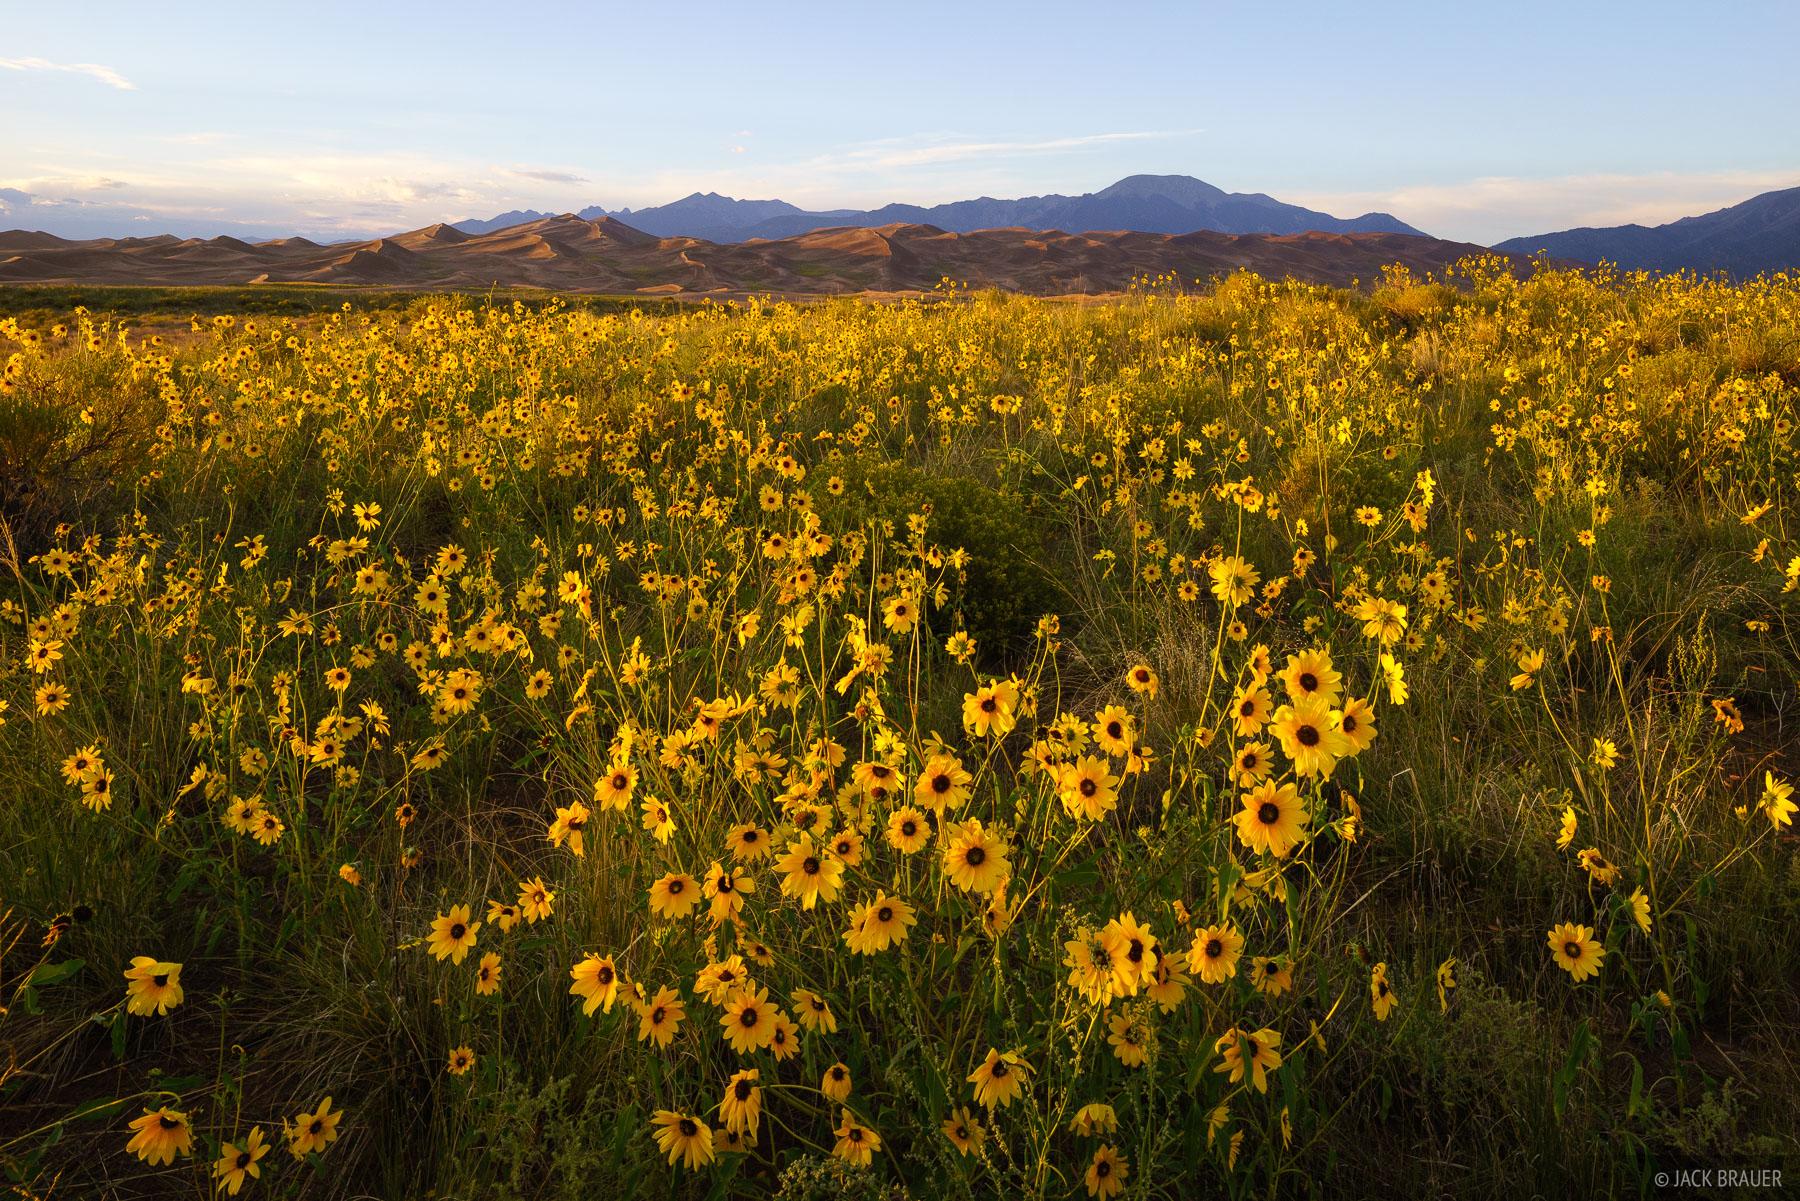 Colorado, Great Sand Dunes, wildflowers, sunflowers, sunset, photo